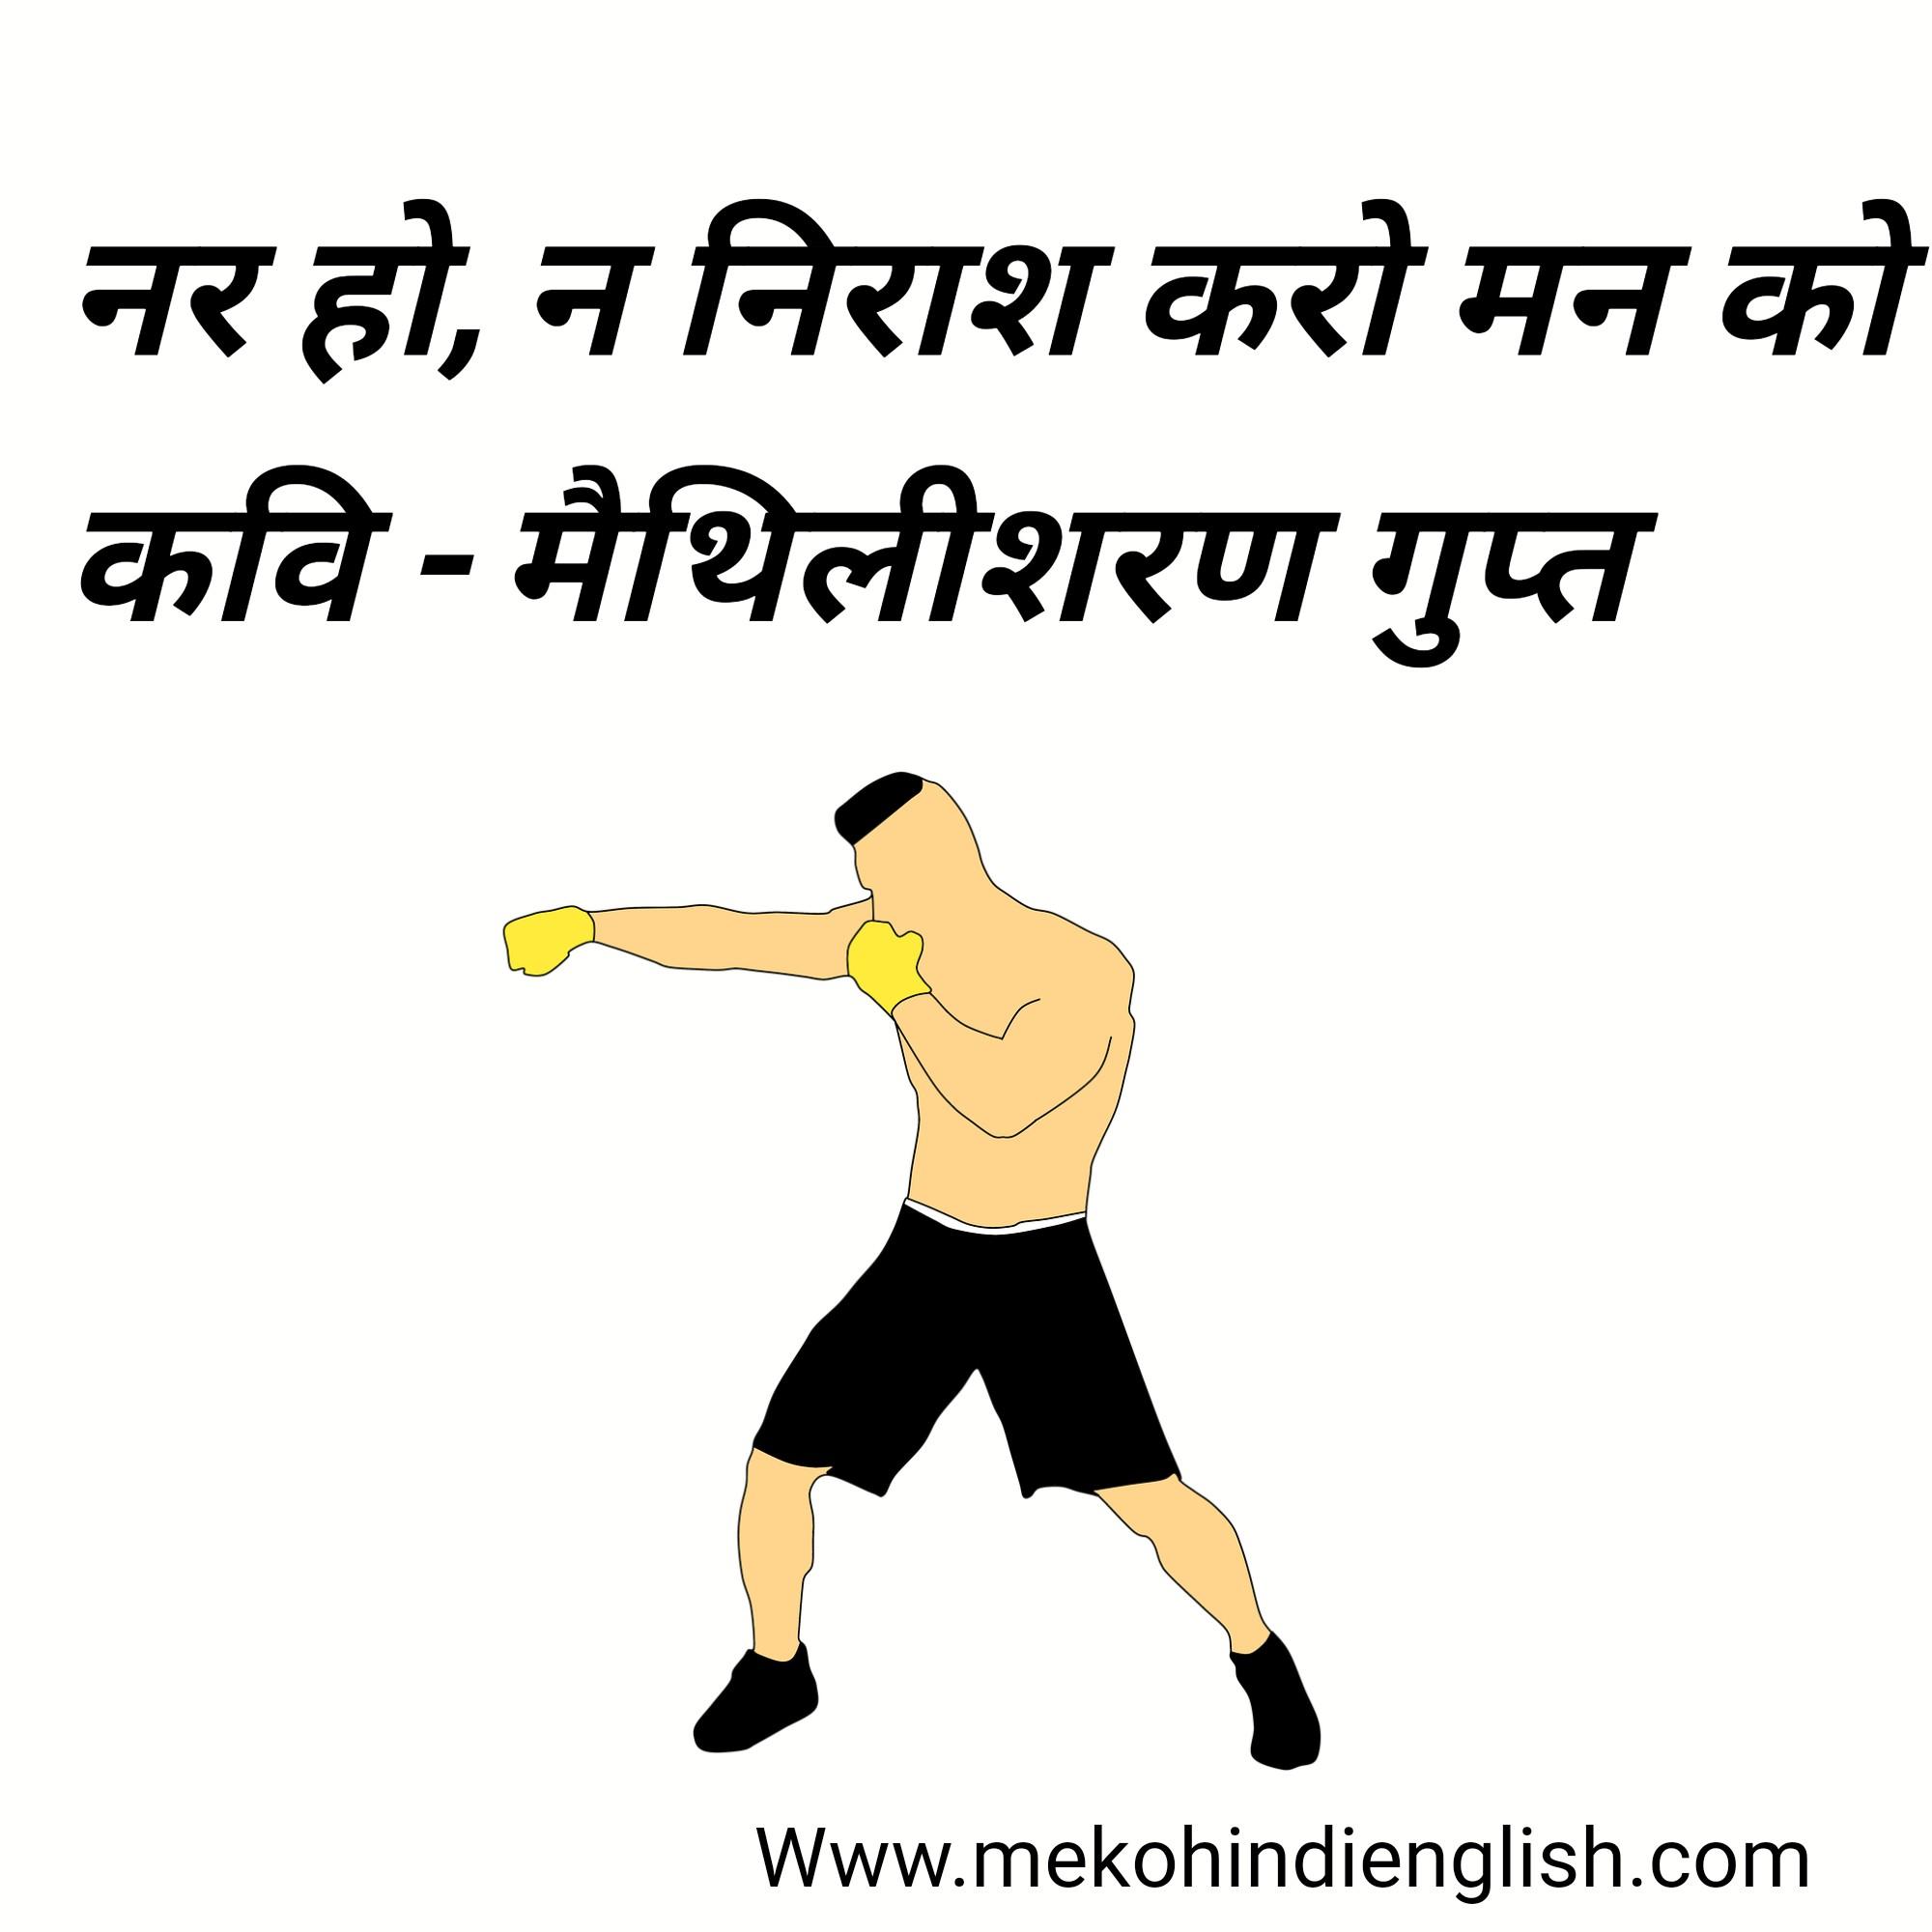 https://www.mekohindienglish.com/2021/01/17-best-motivational-poempoetry-in-hindi.html